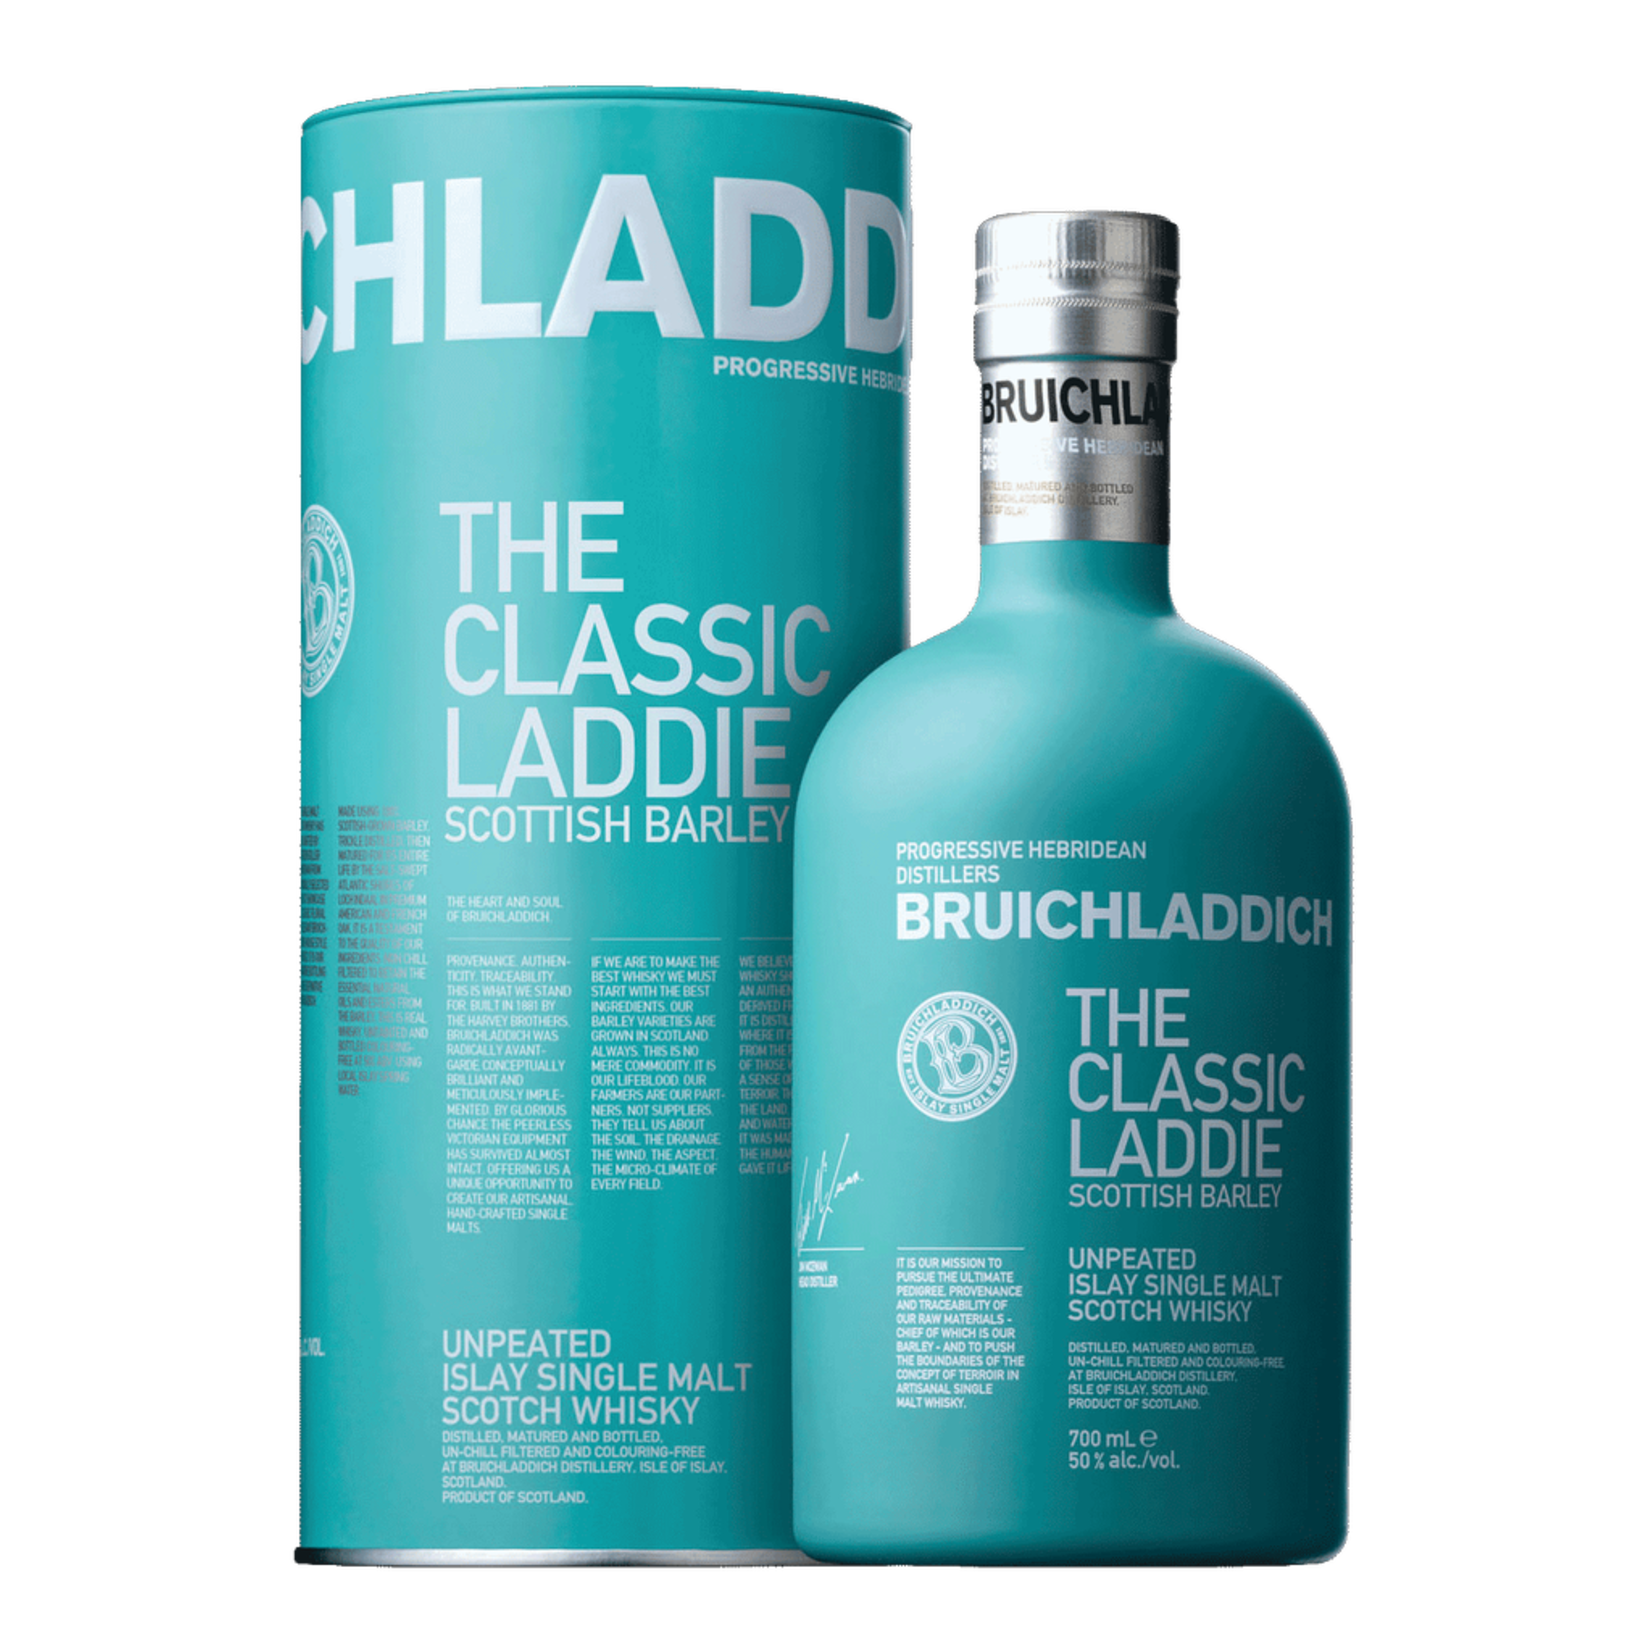 Spirits Bruichladdich Scotch Single Malt The Laddie Scottish Barley